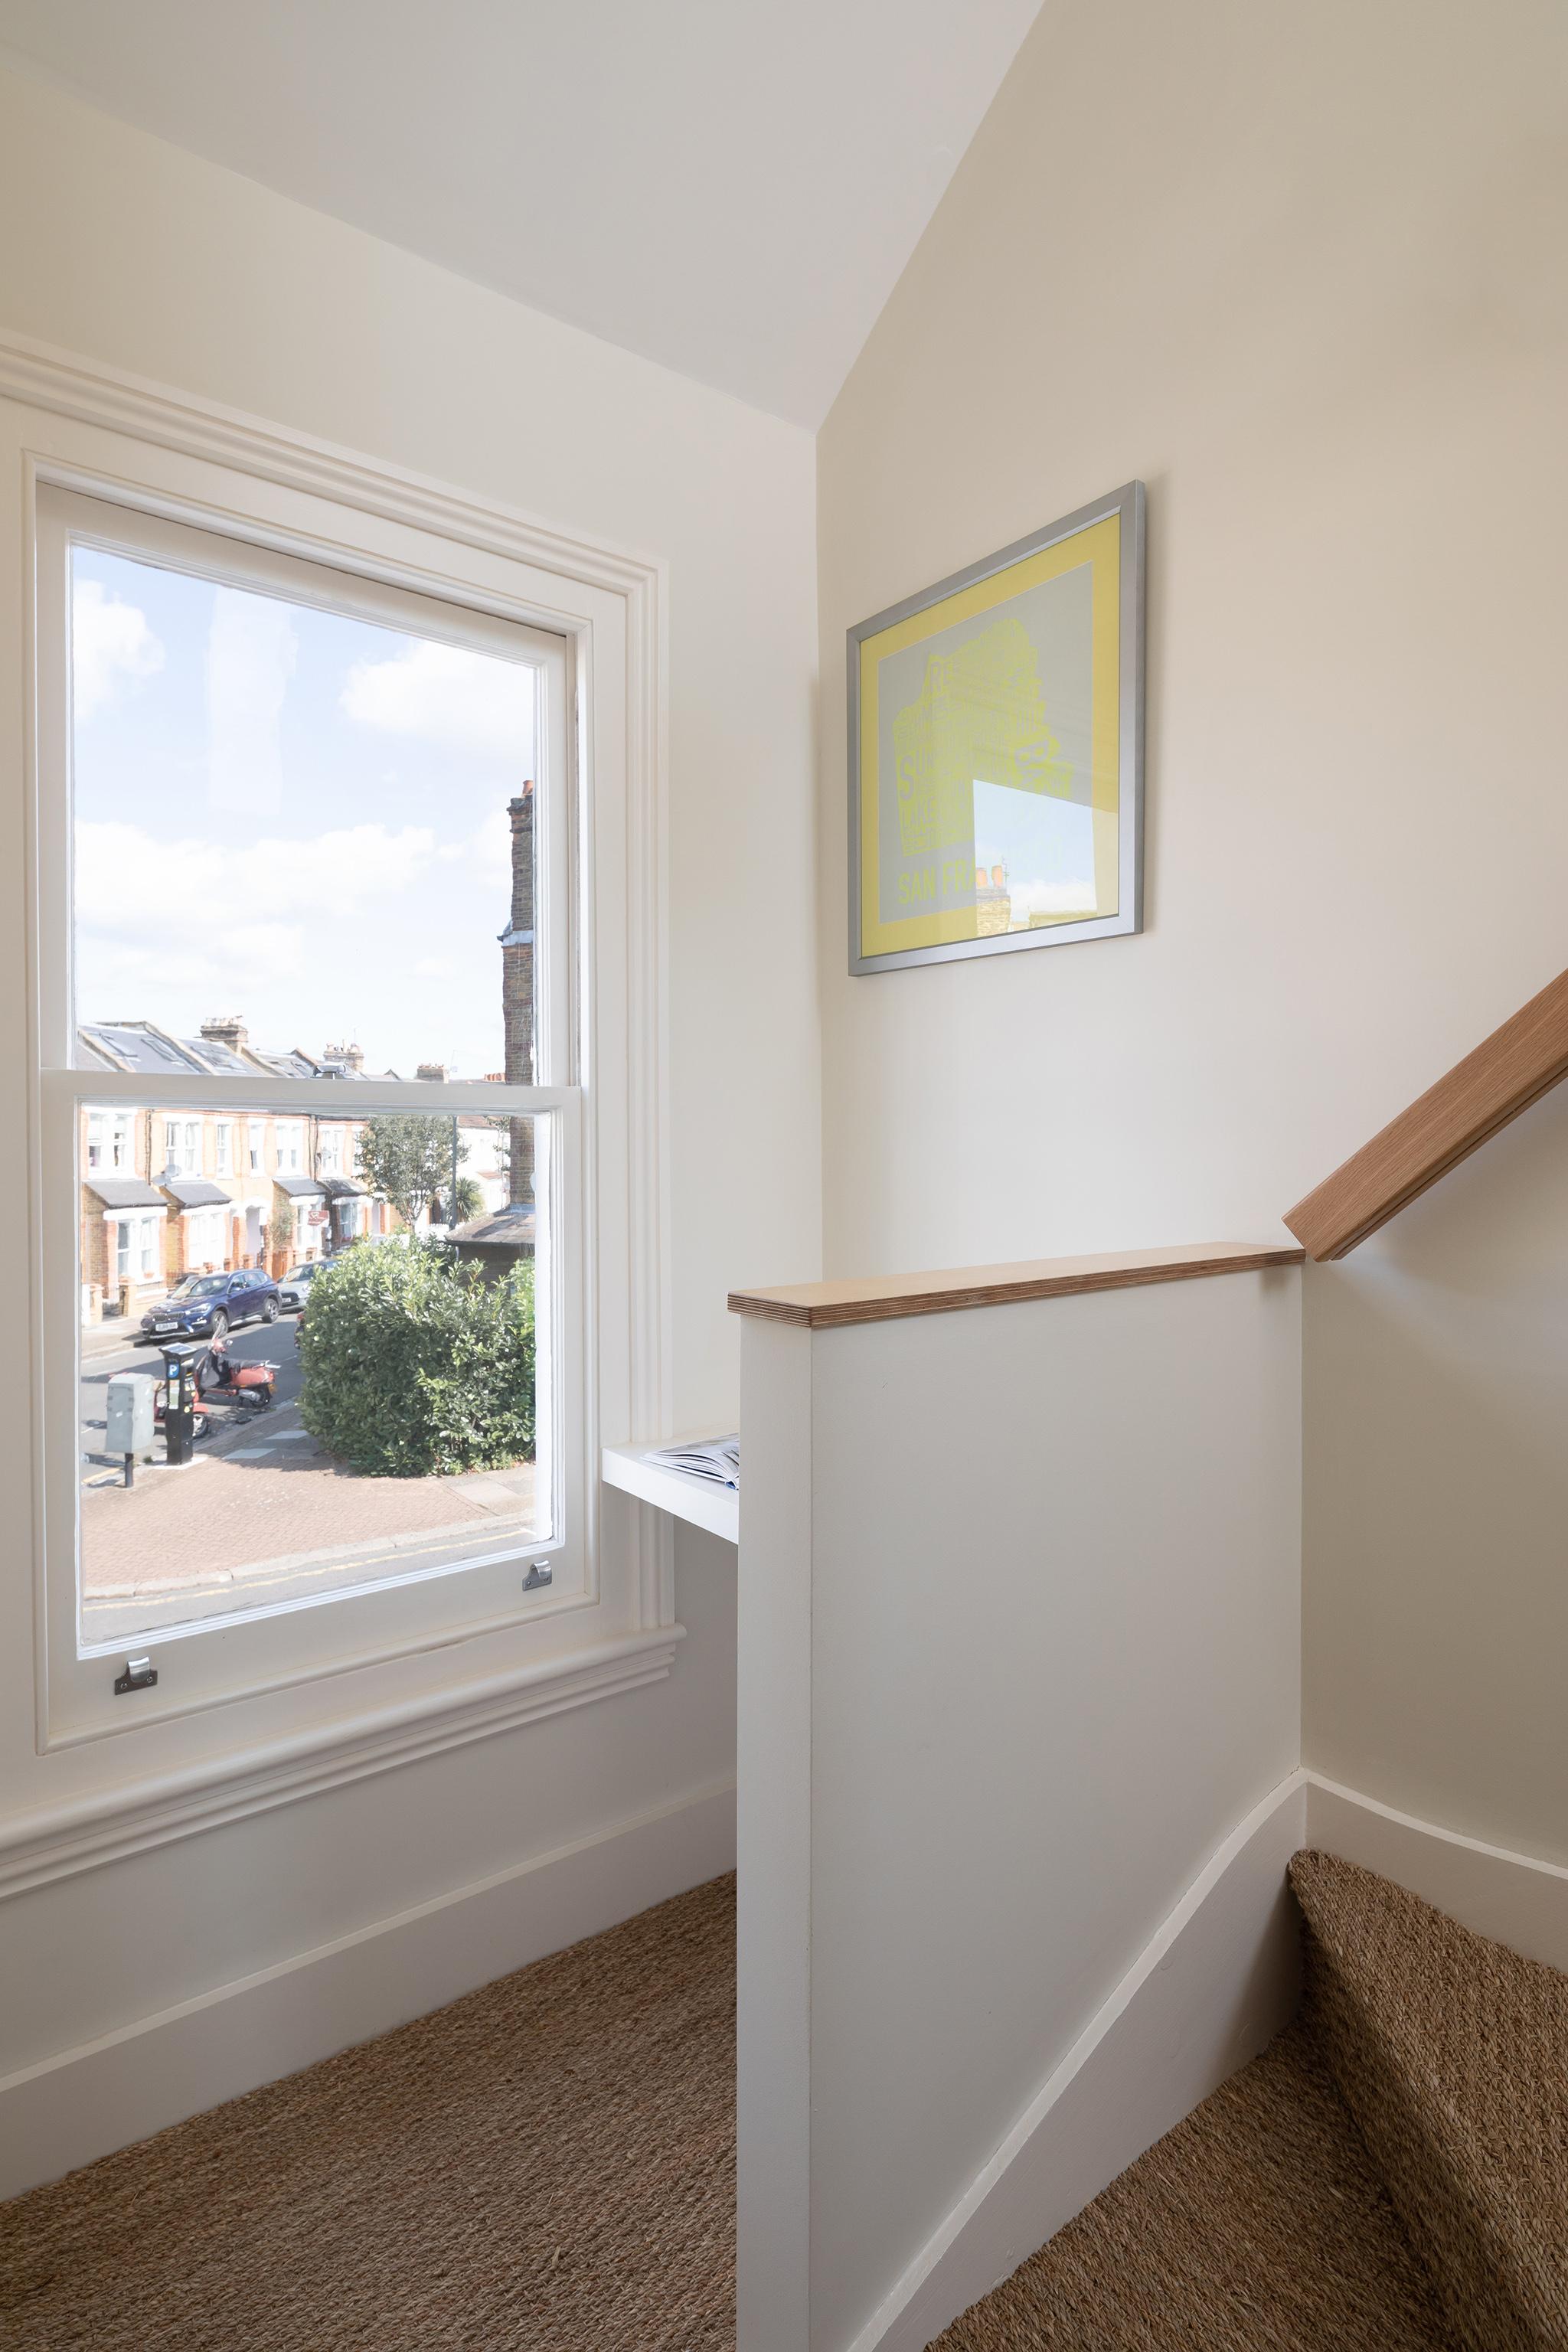 02-smeaton-road-victorian-house-roof-extension-loft-conversion-site-photo-architecture-wandsworth-south-london-uk-rider-stirland-architects-adam-scott.jpg